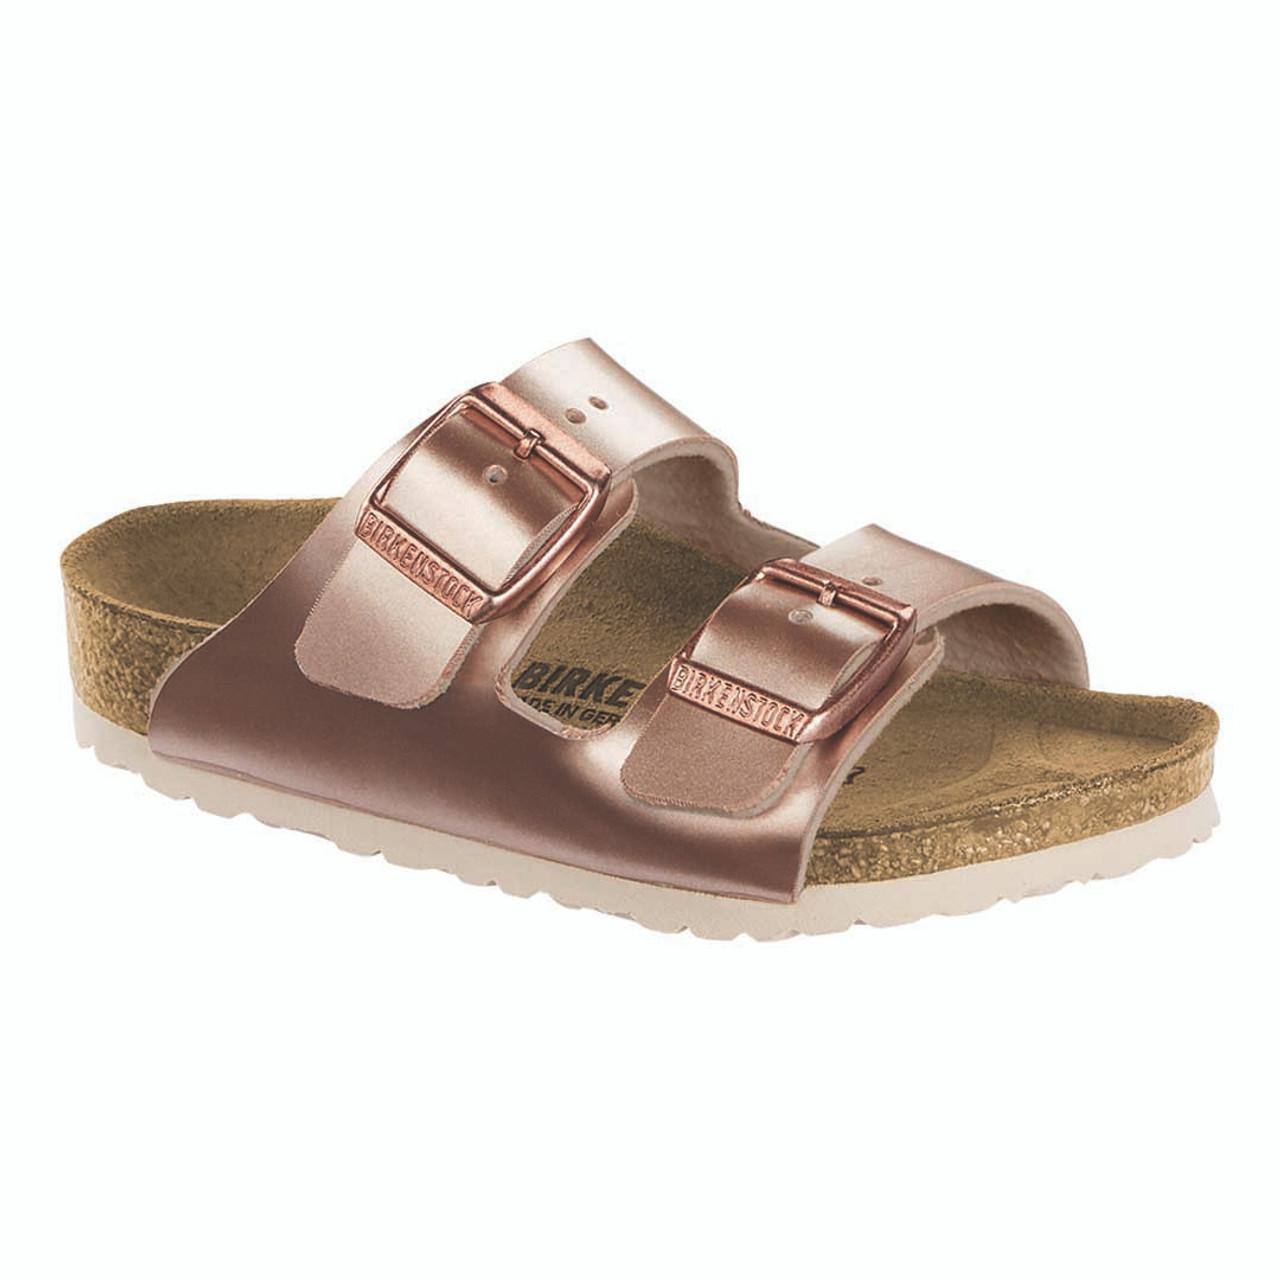 6a6d5076d Kids' Electric Metallic Copper Birko-Flor Arizona Essentials Sandals -  TYLER'S